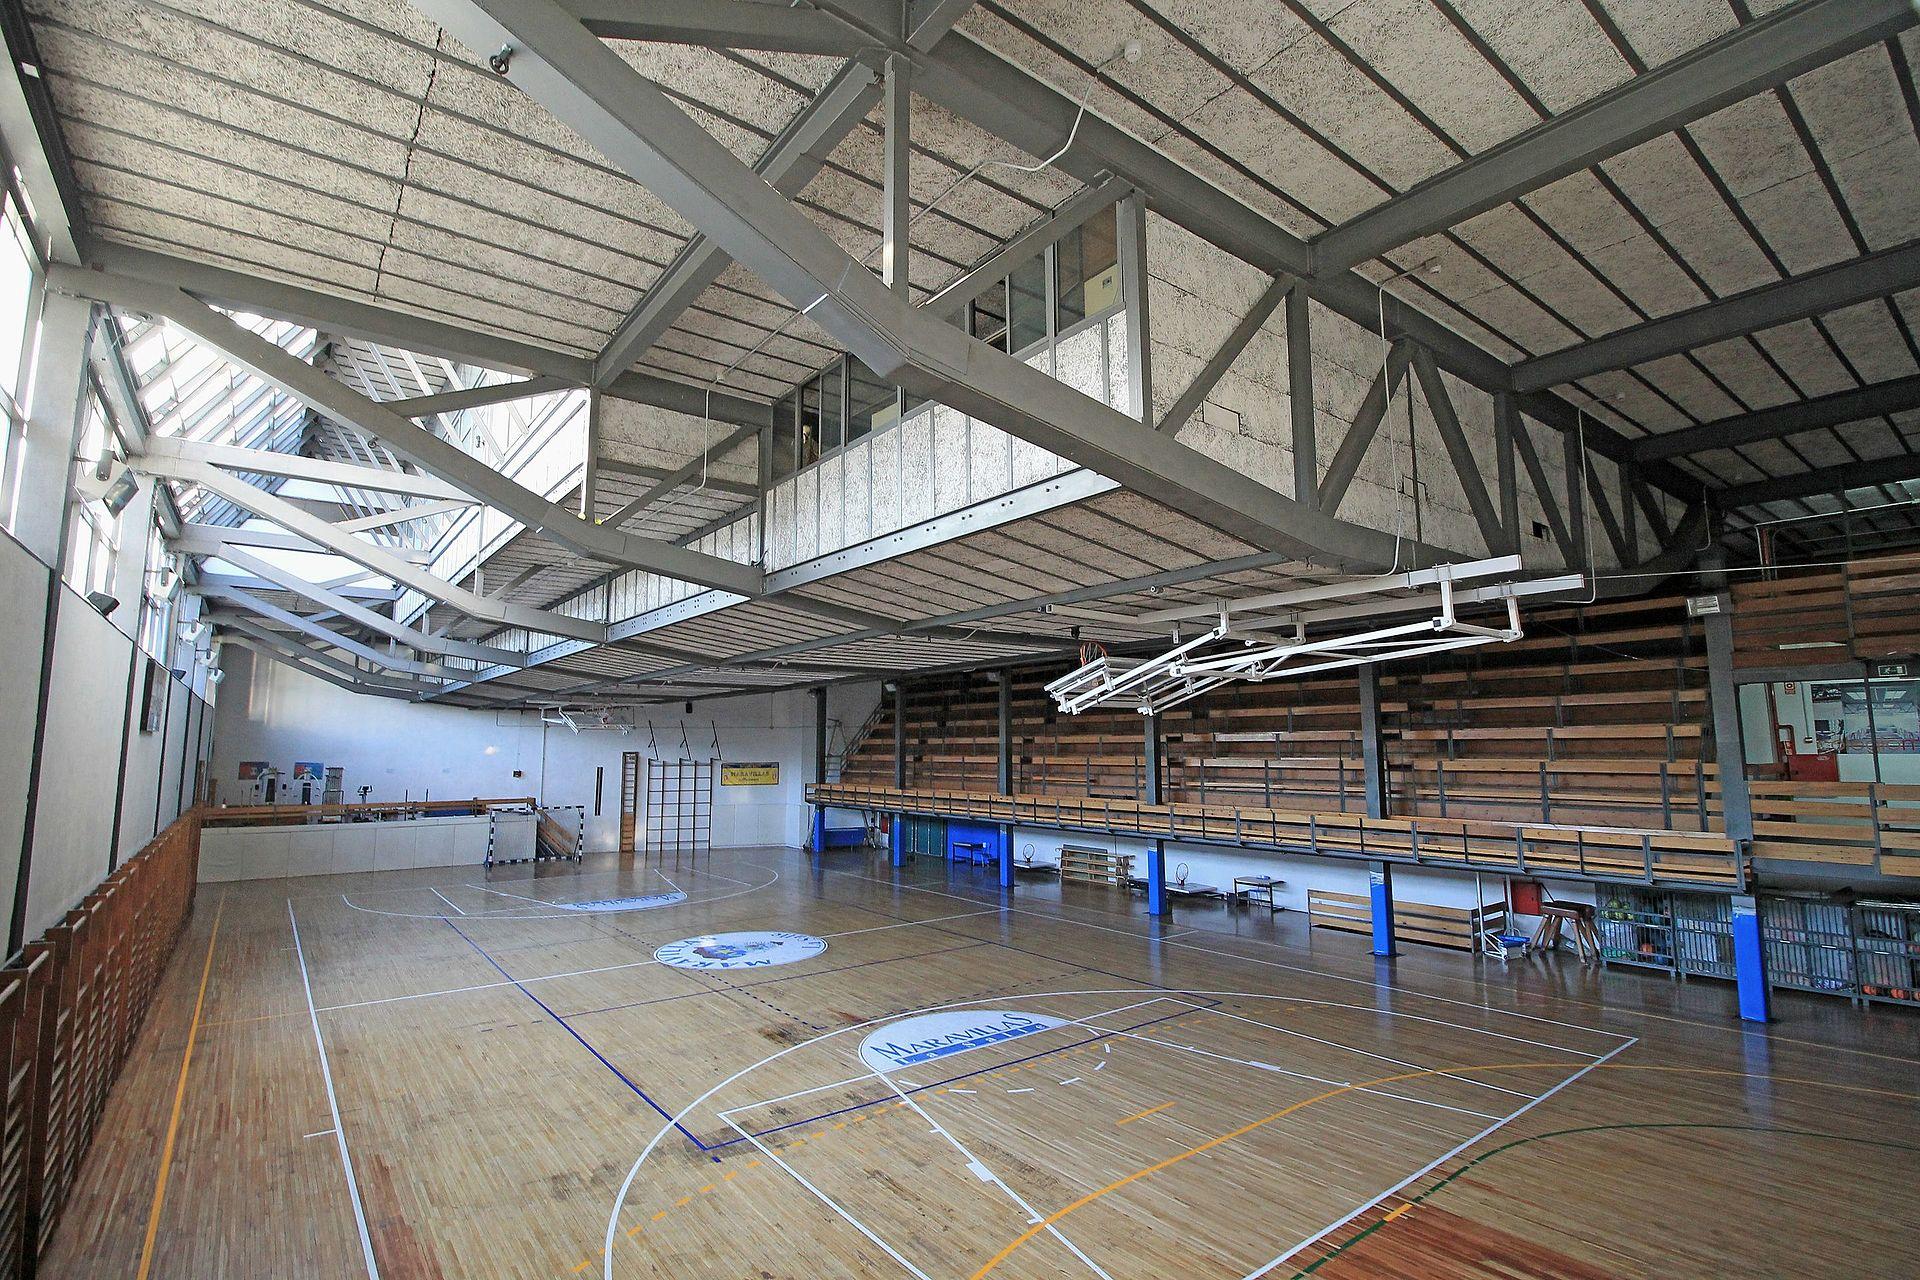 Gimnasio del colegio maravillas wikipedia la for Gimnasios madrid con piscina